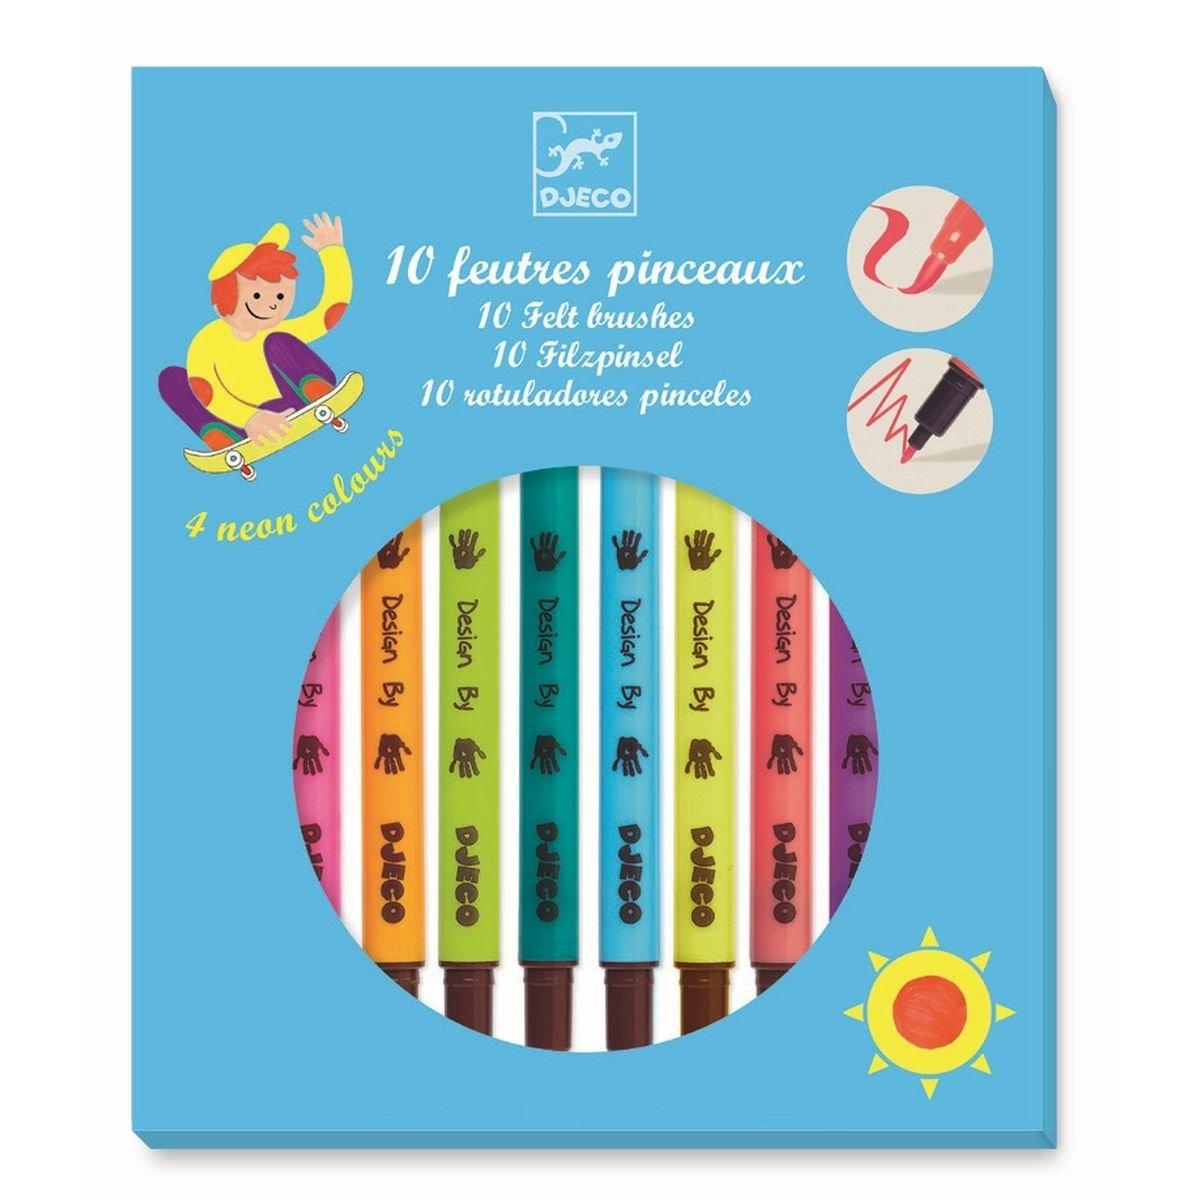 10 Rotuladores Punta Fina-Pincel Colores Pop, Estuche Azul Djeco